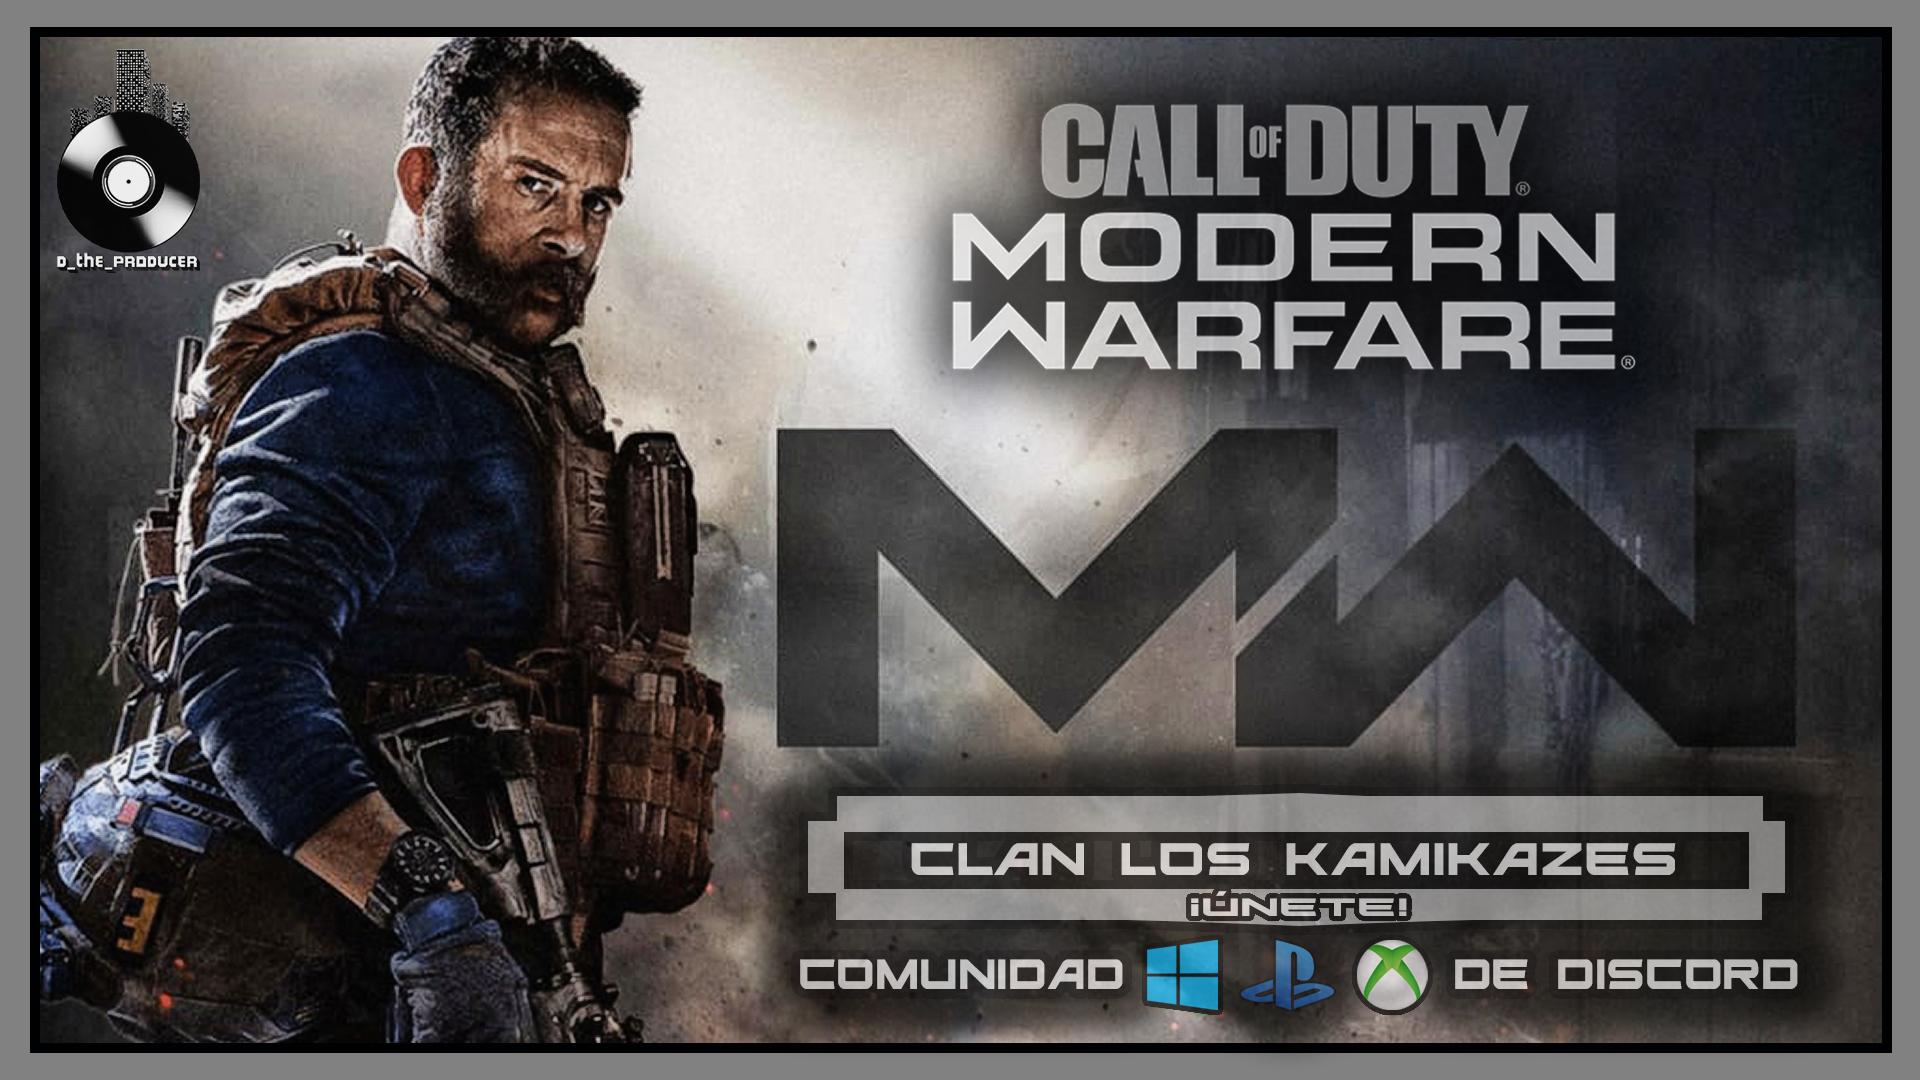 Los_Kamikazes_CoD_MW_Price_2_Reclutando.